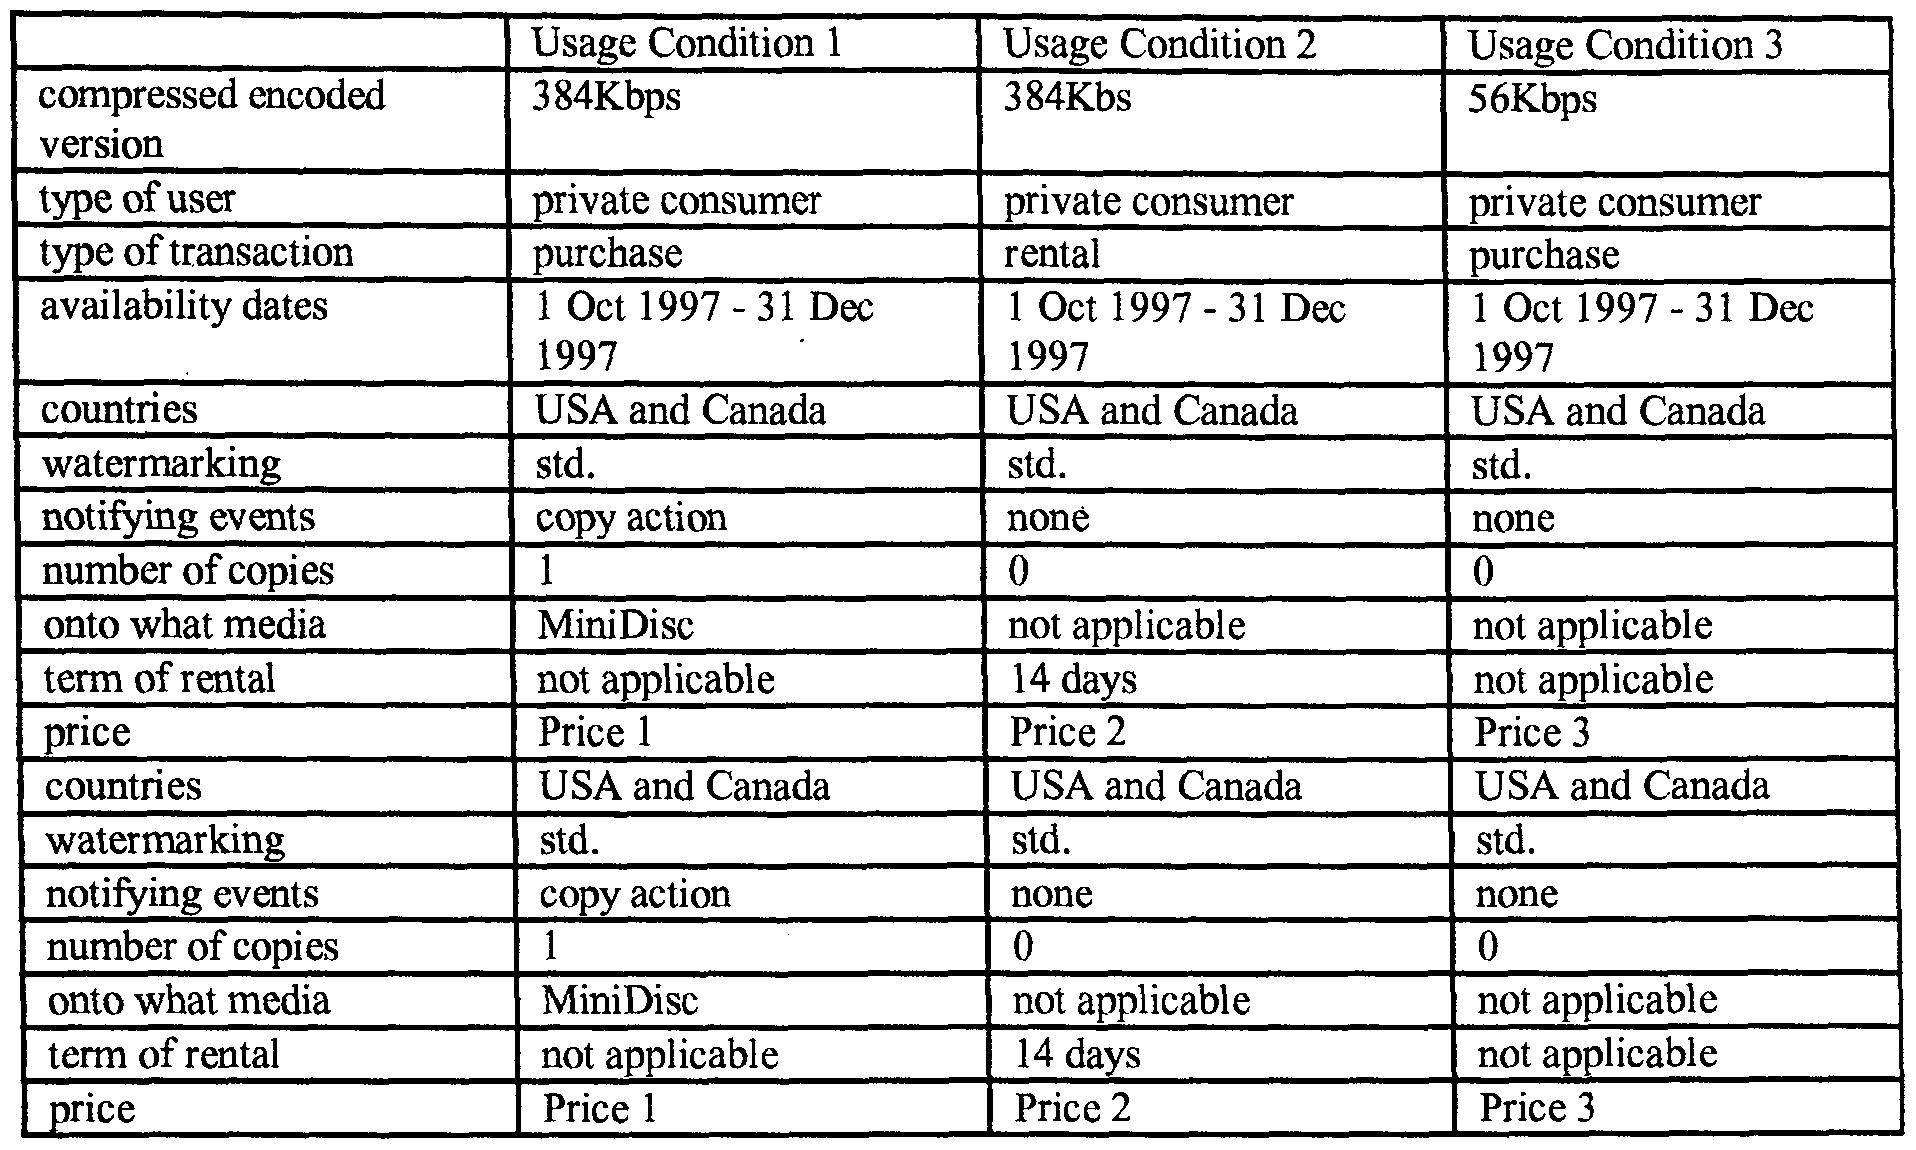 atomic email hunter 810 serial number